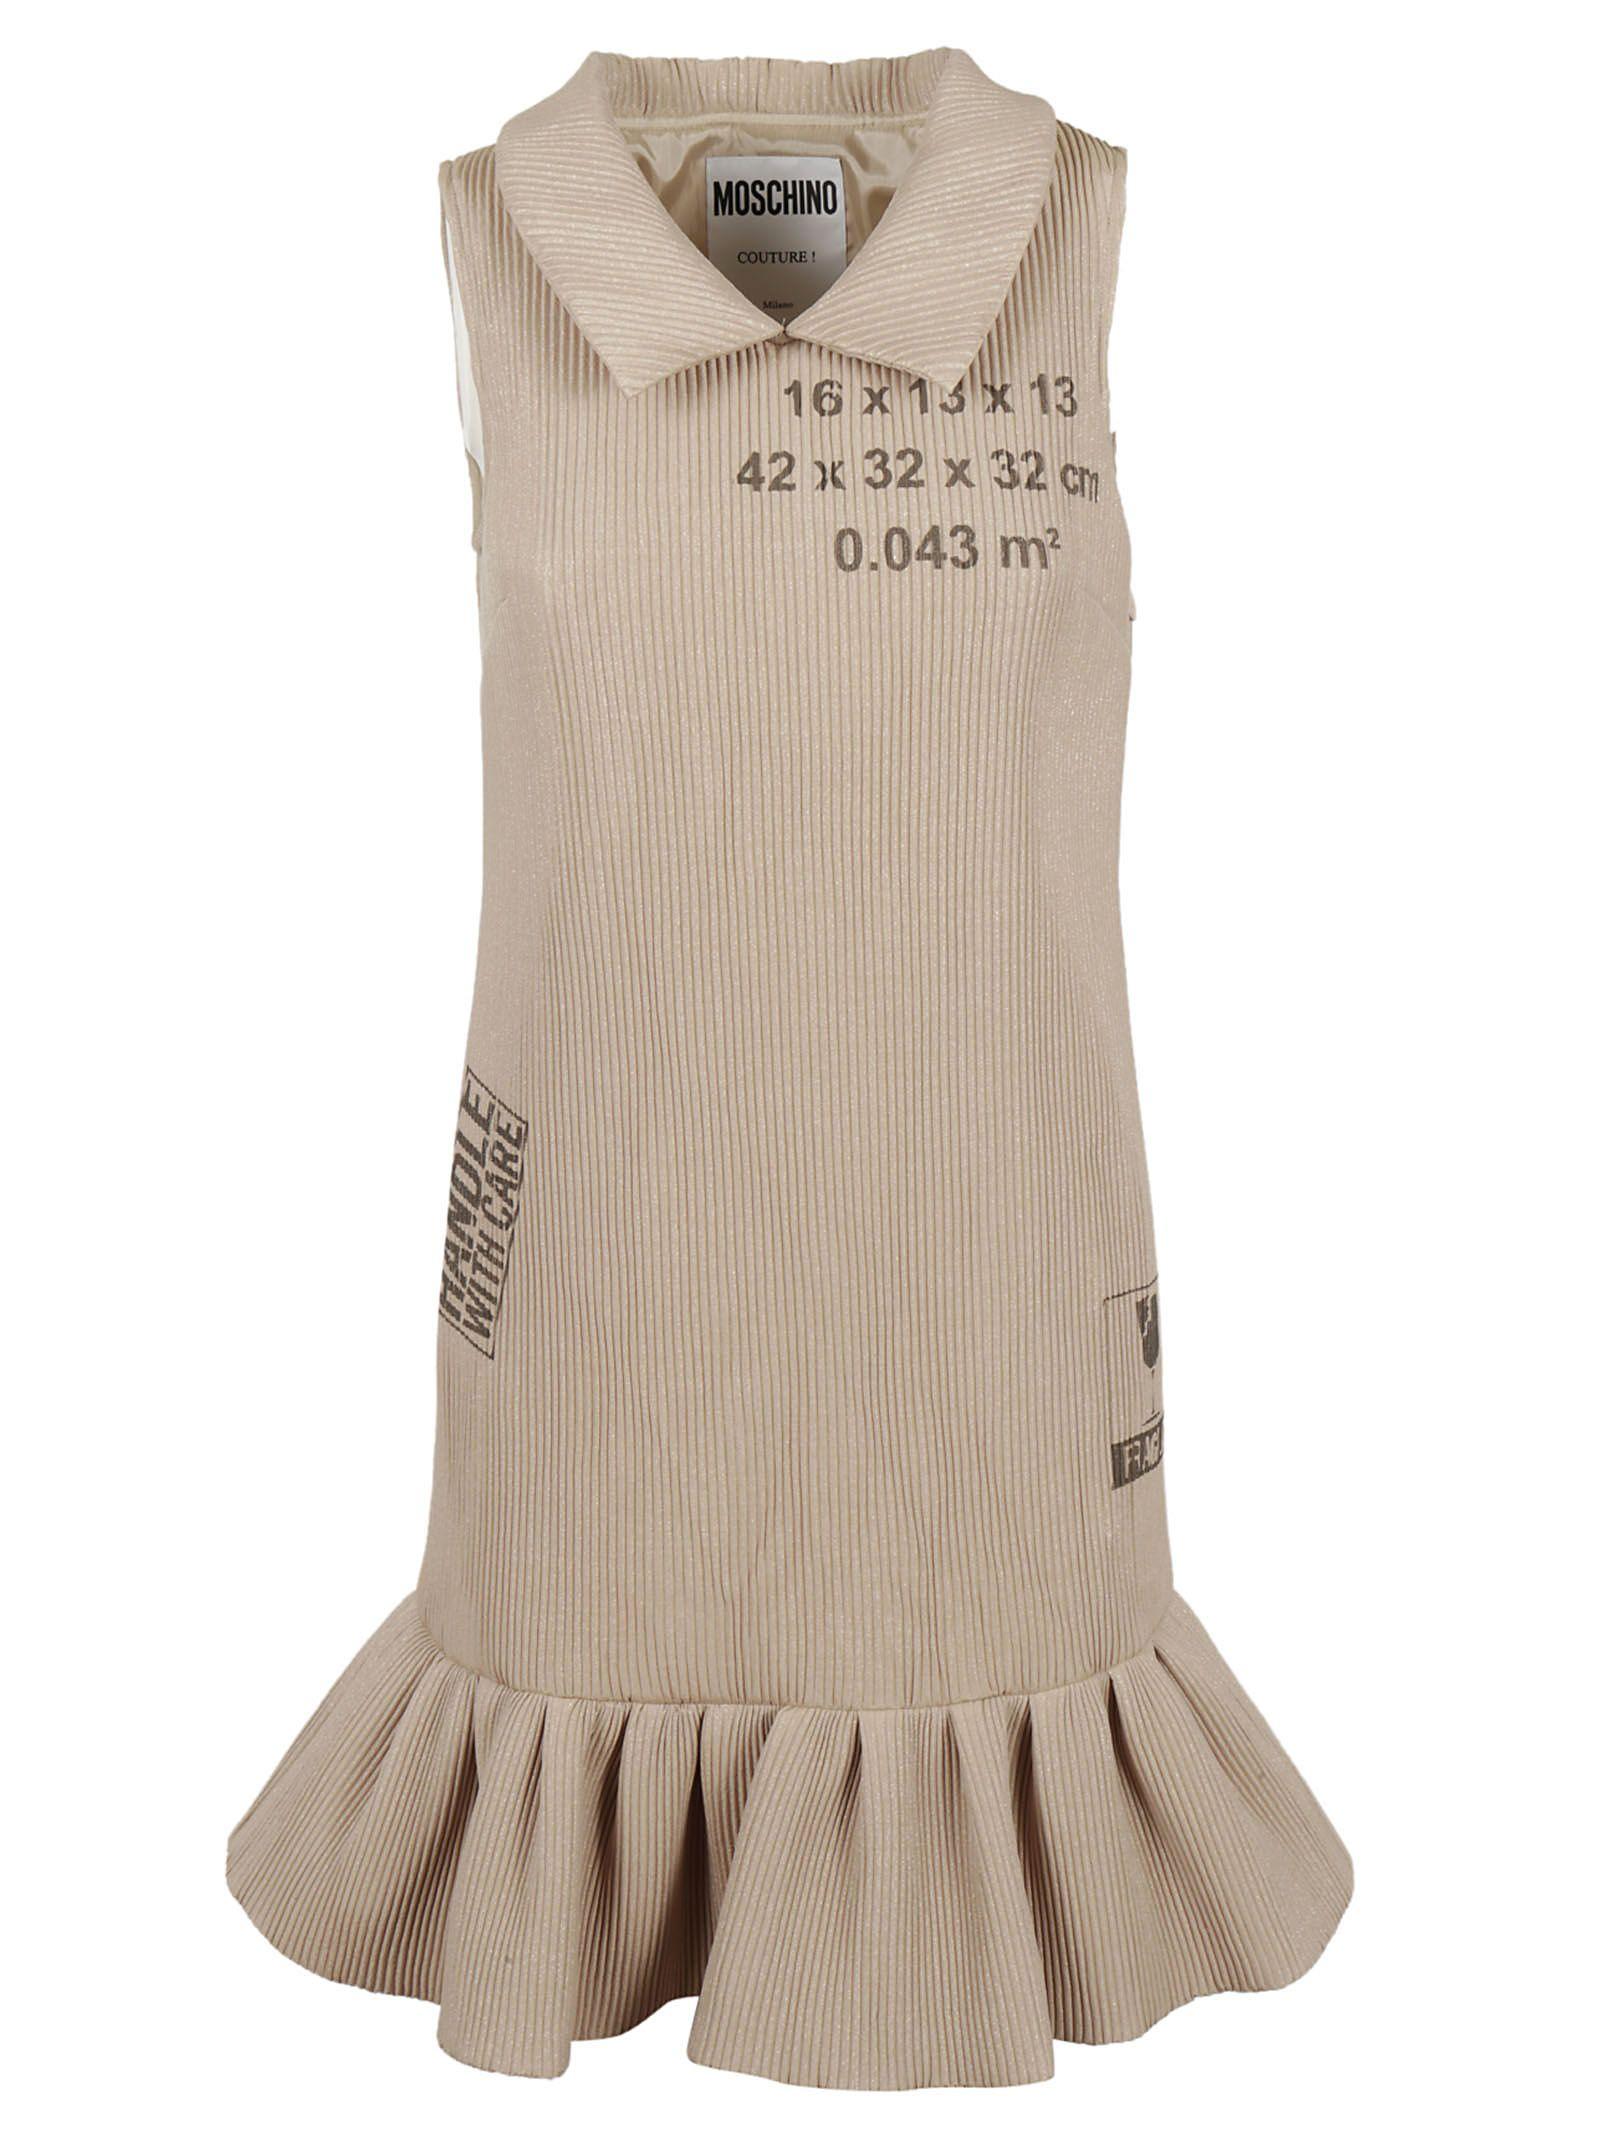 Moschino Ribbed Dress